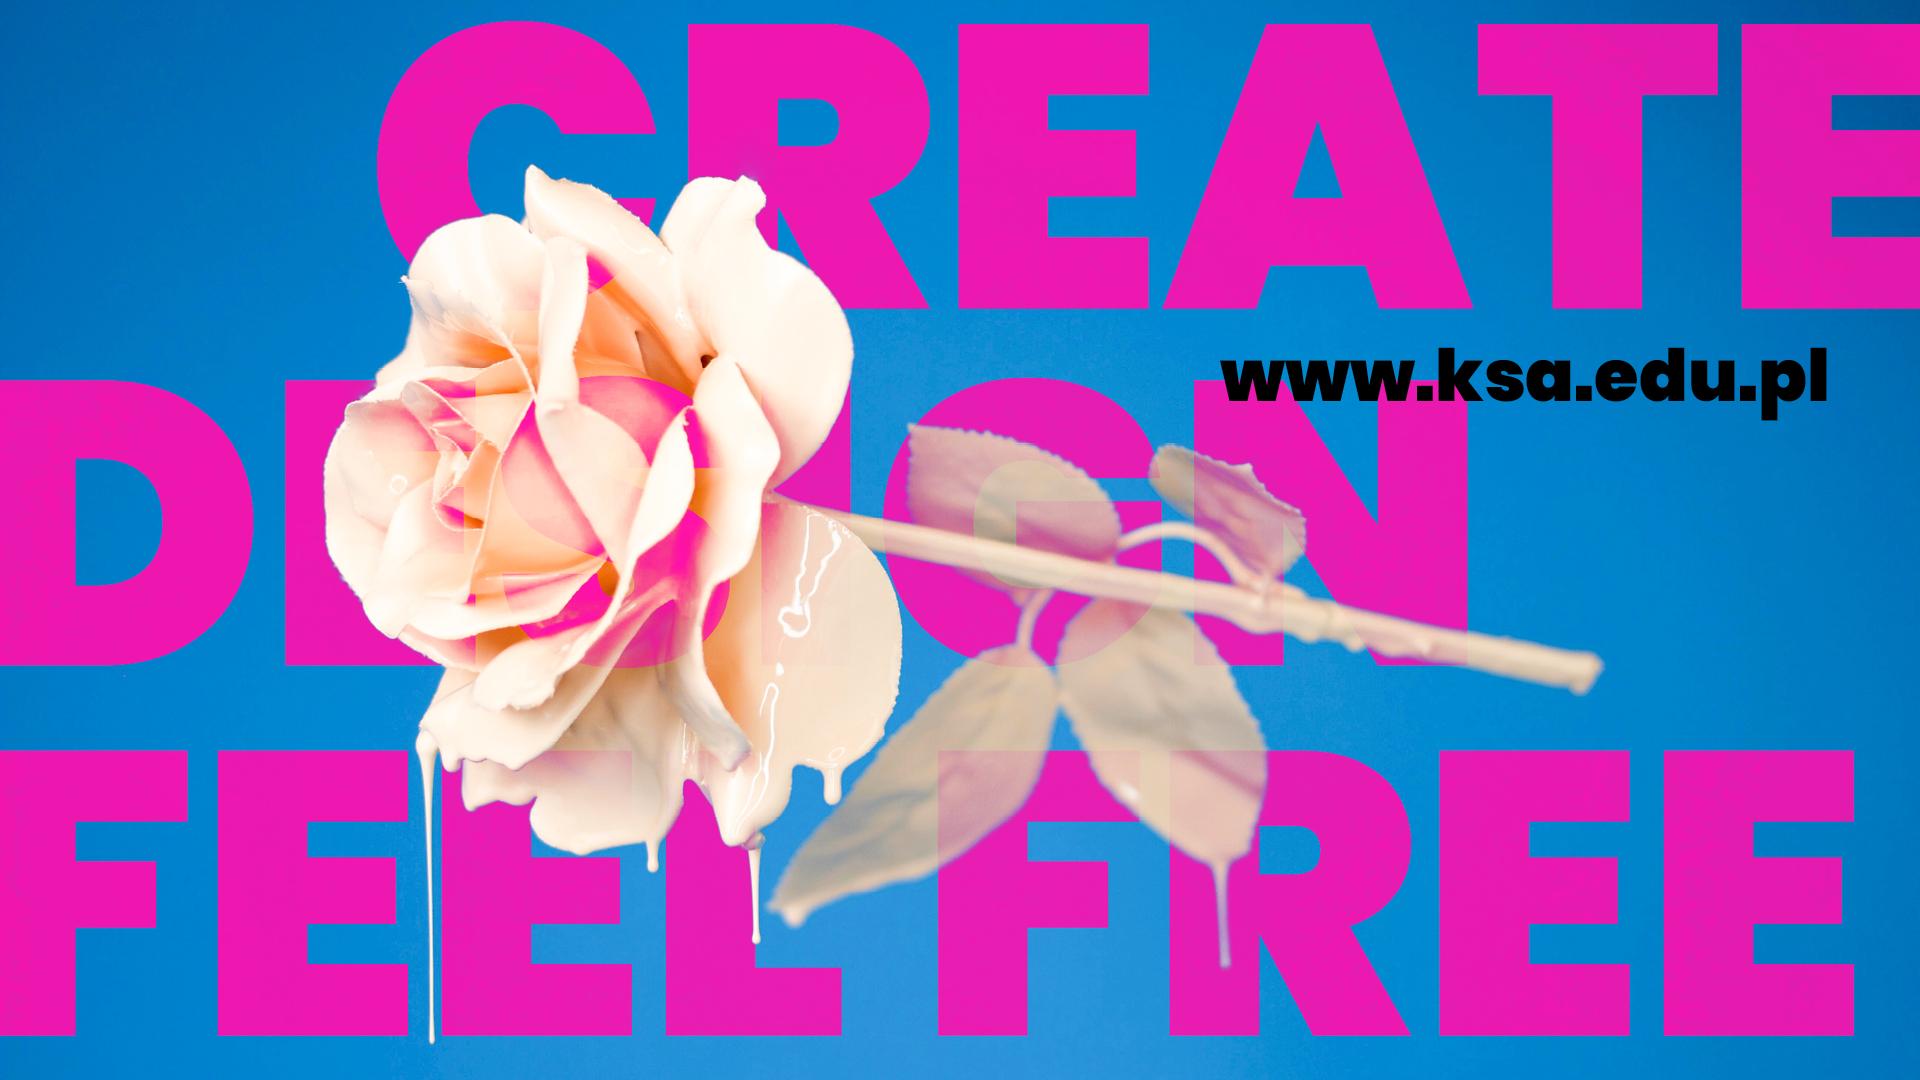 benr promujacy KSA z napisem Create, Design, Feel free